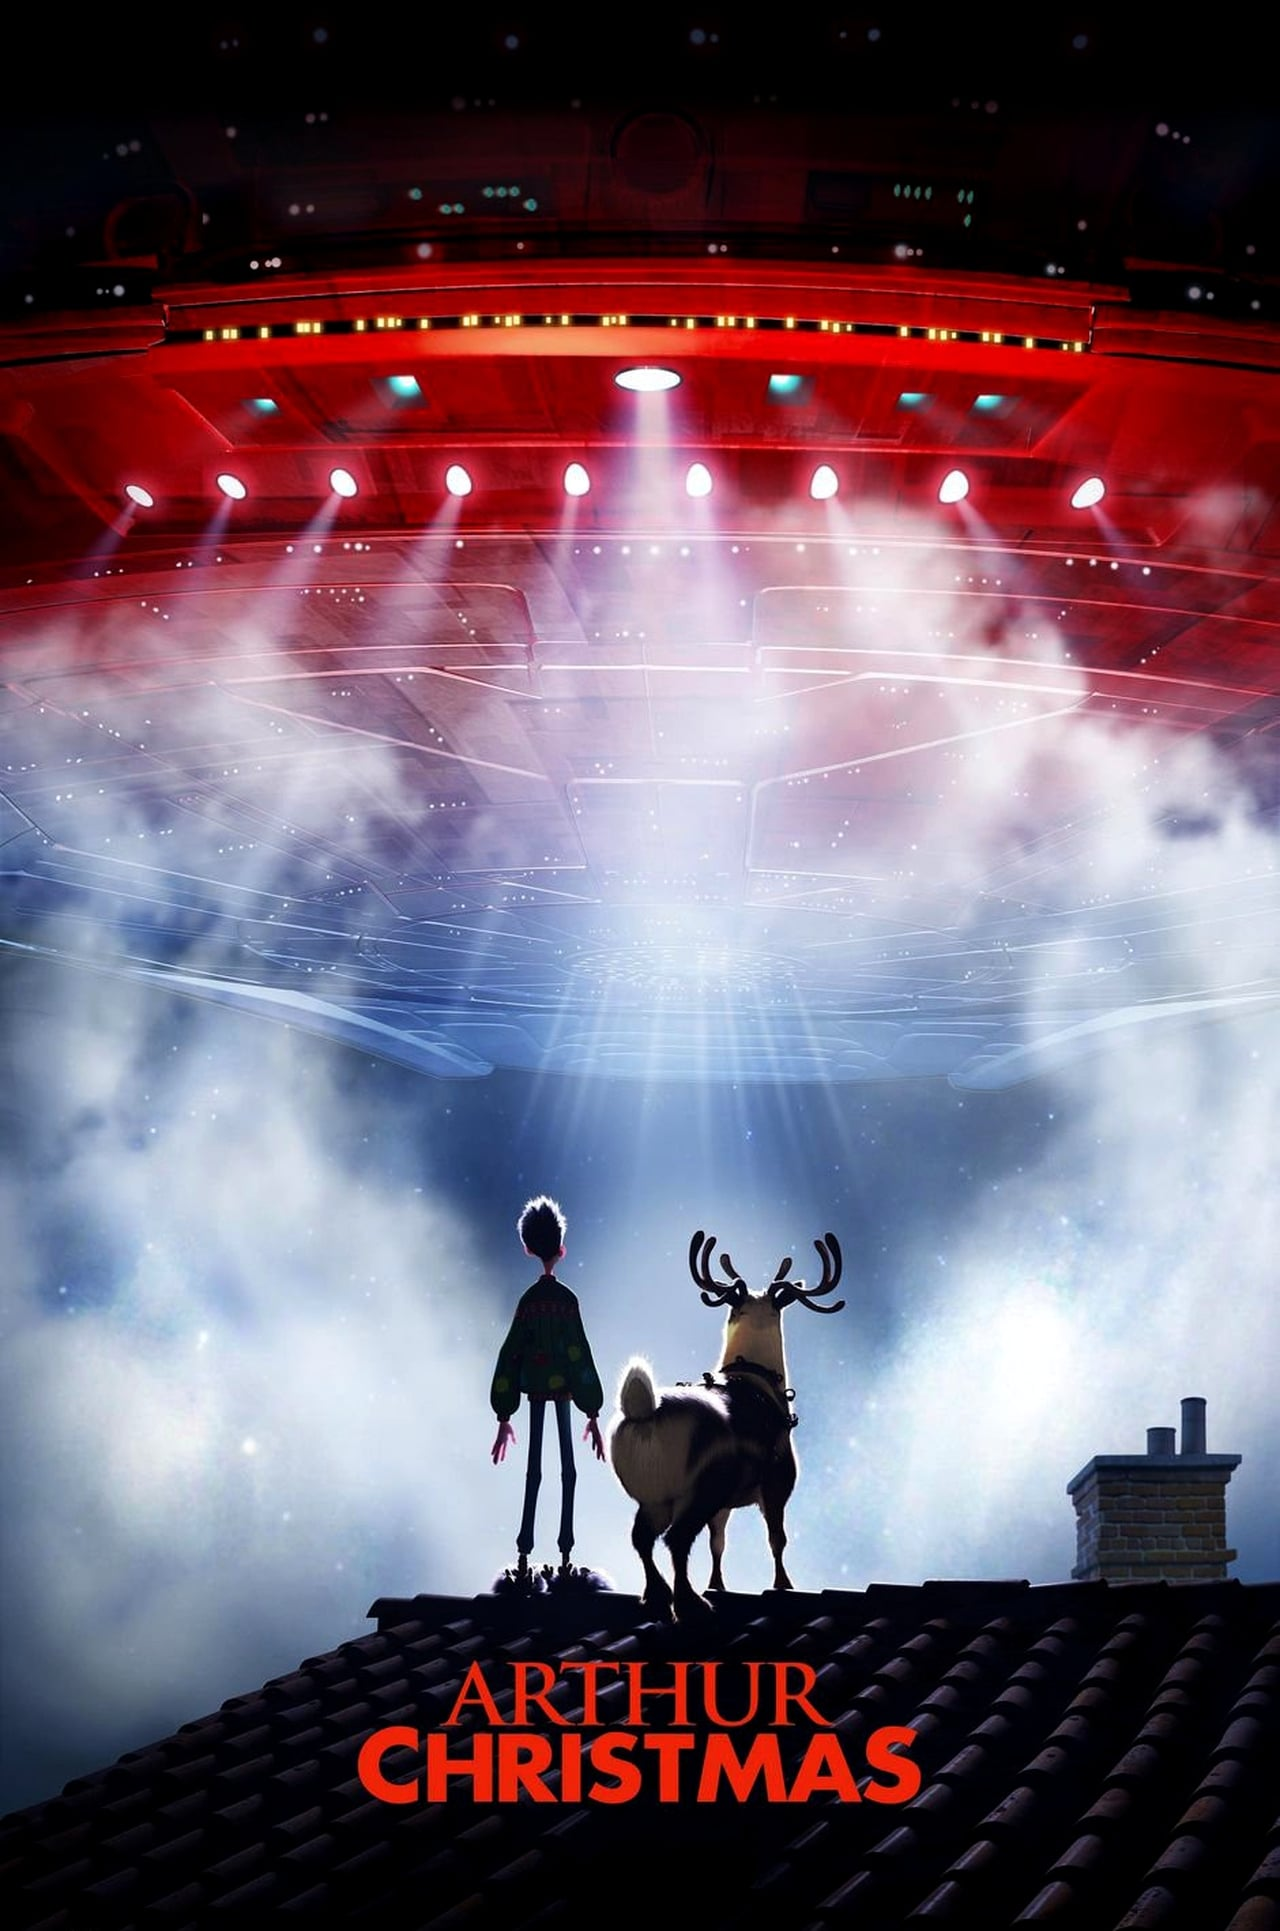 Watch Arthur Christmas 2011 Full Movie Online Free - 123Movies-3612